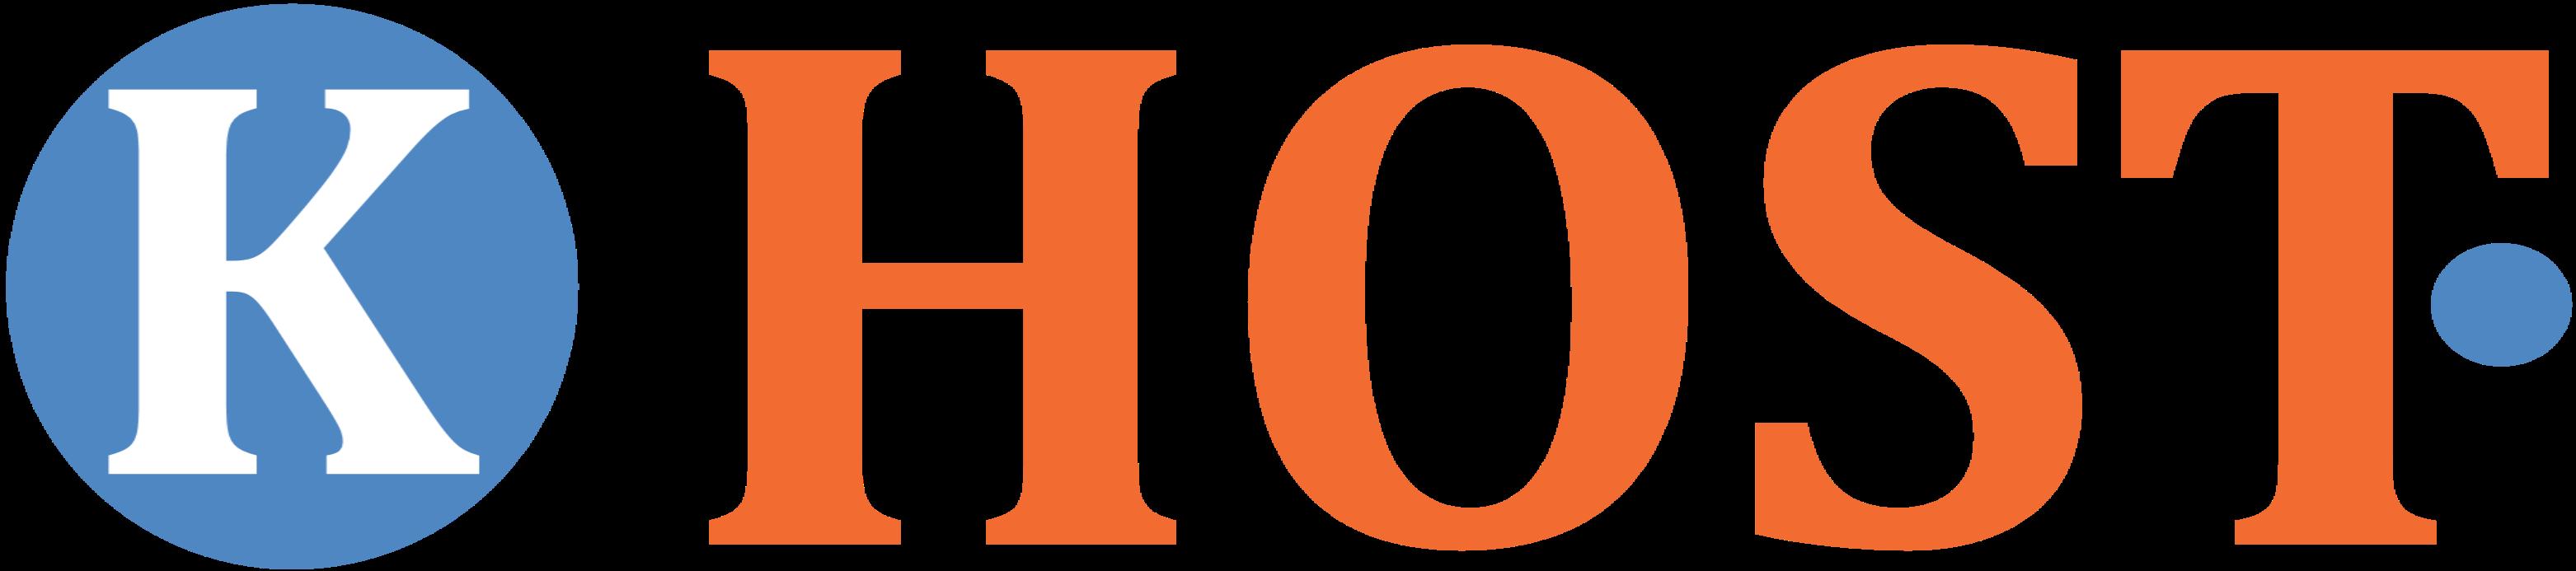 KivuHost.com.